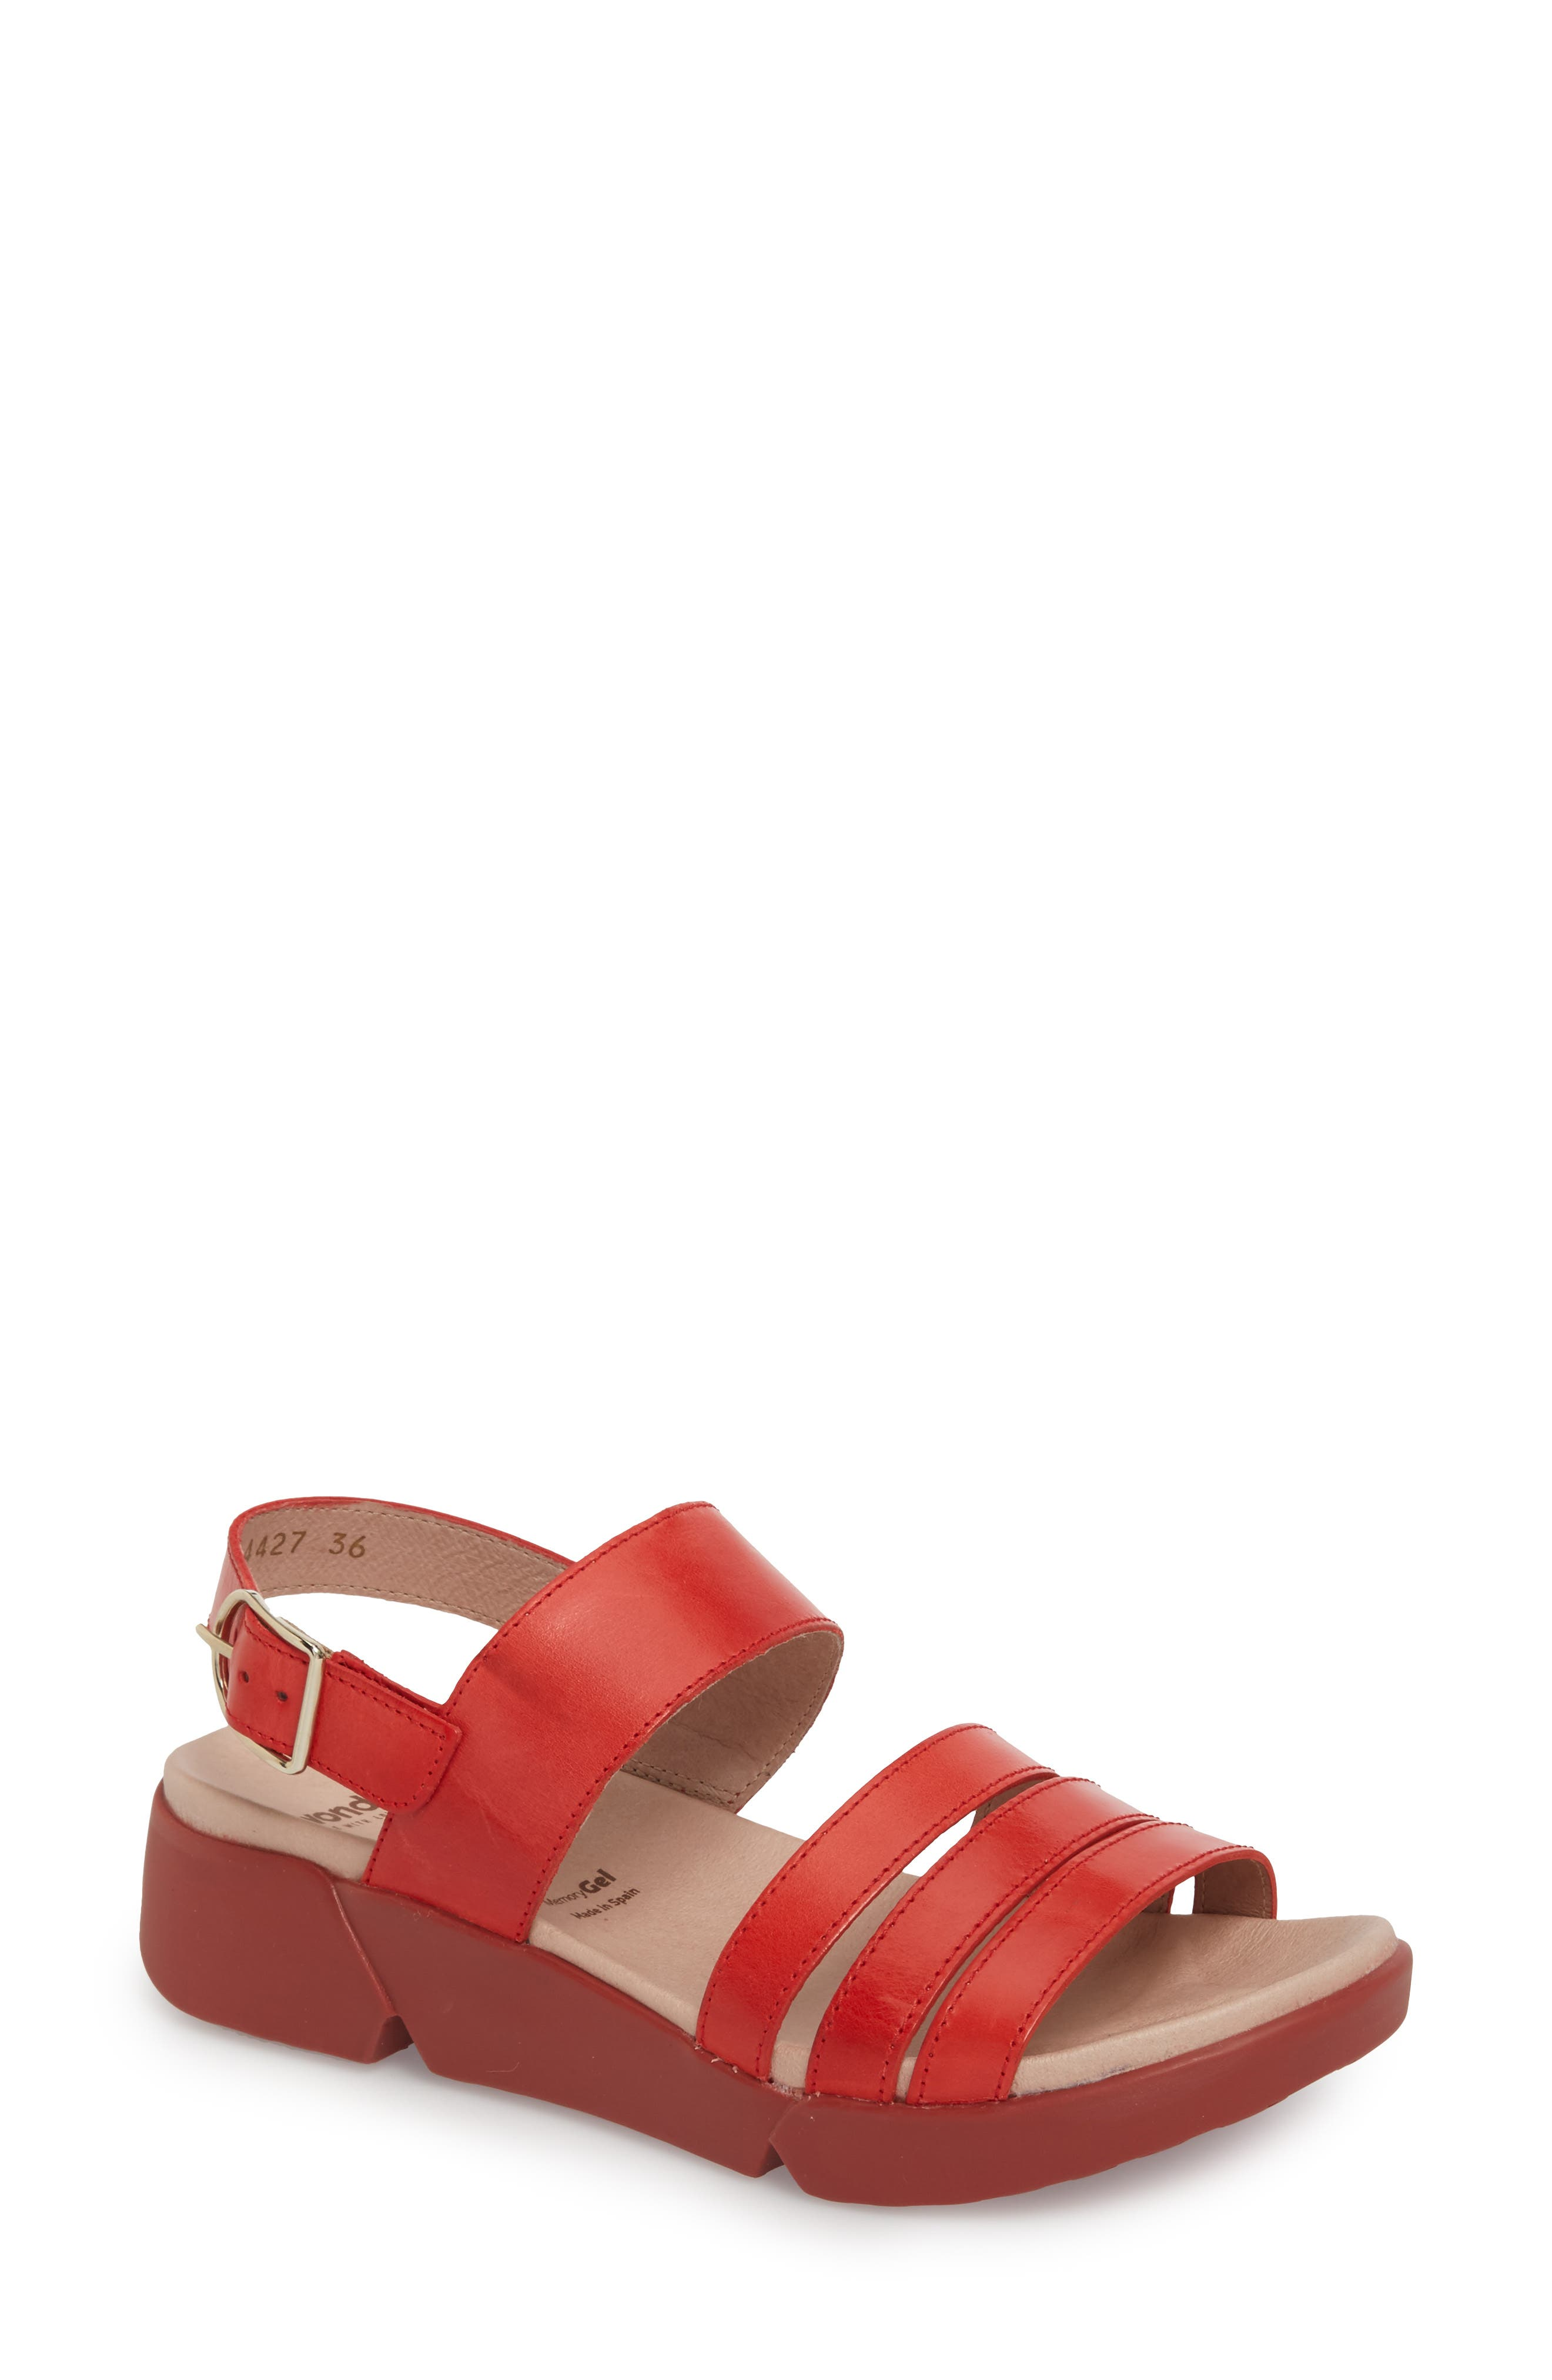 Wonders A-8004 Sandal - Red